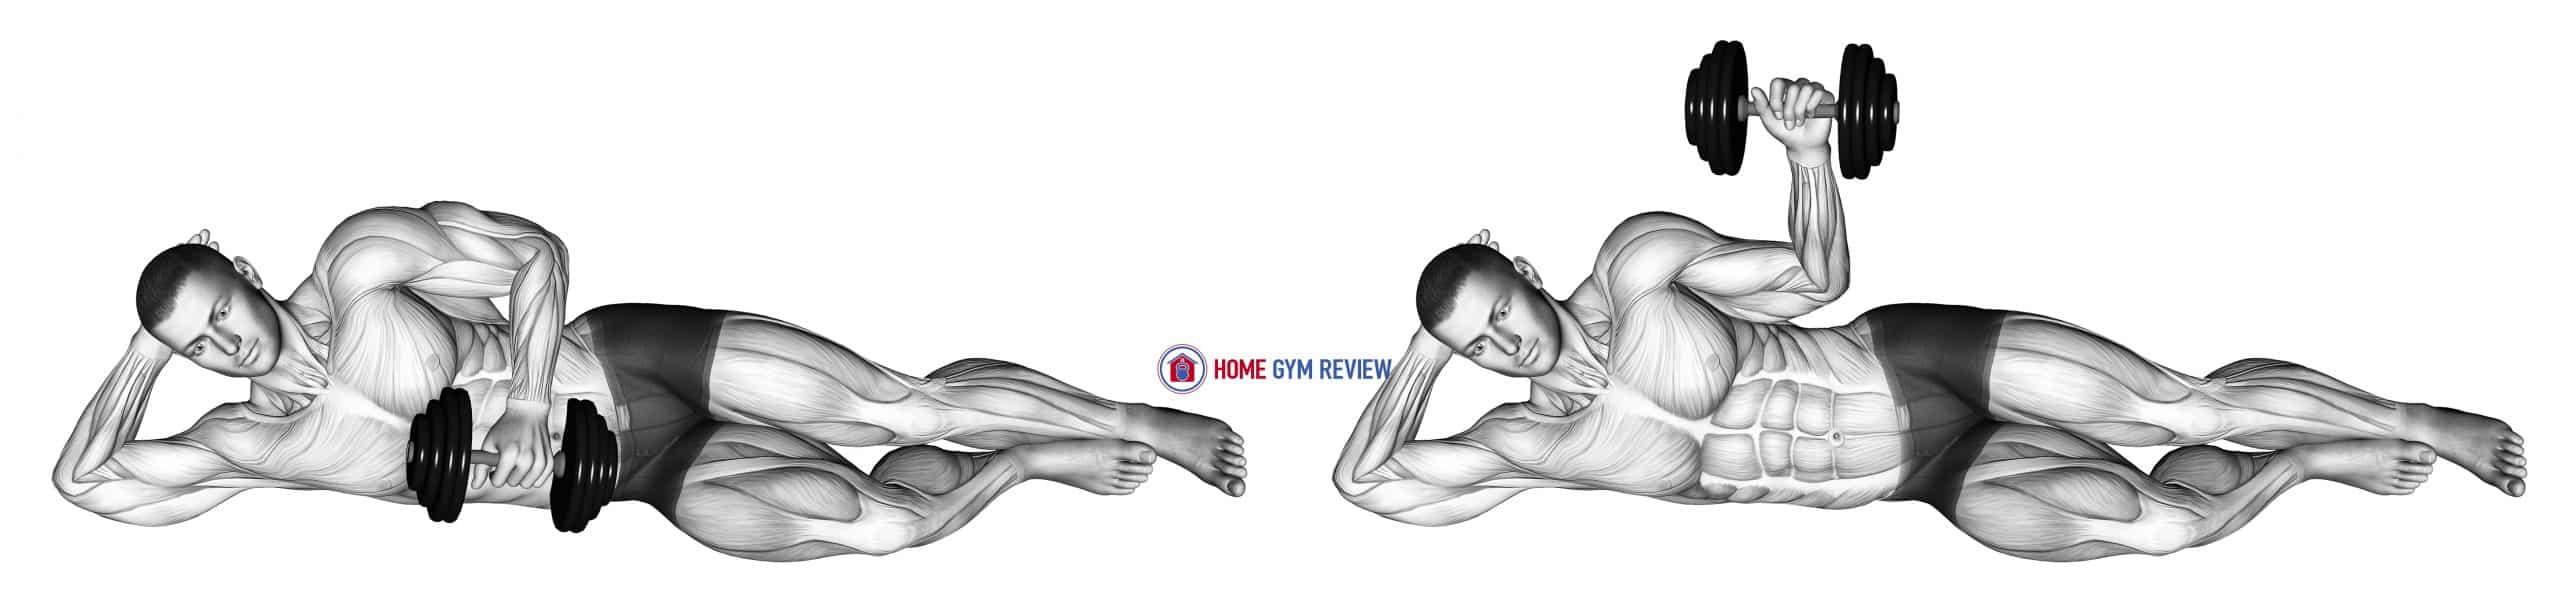 Dumbbell lying external shoulder rotation